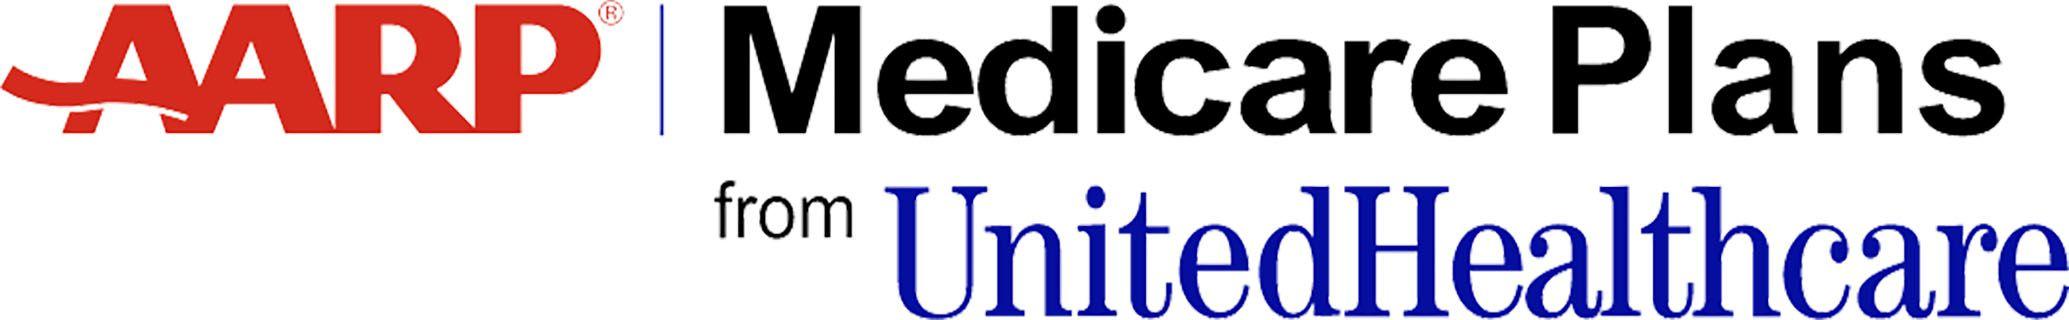 AARP by UnitedHealthcare